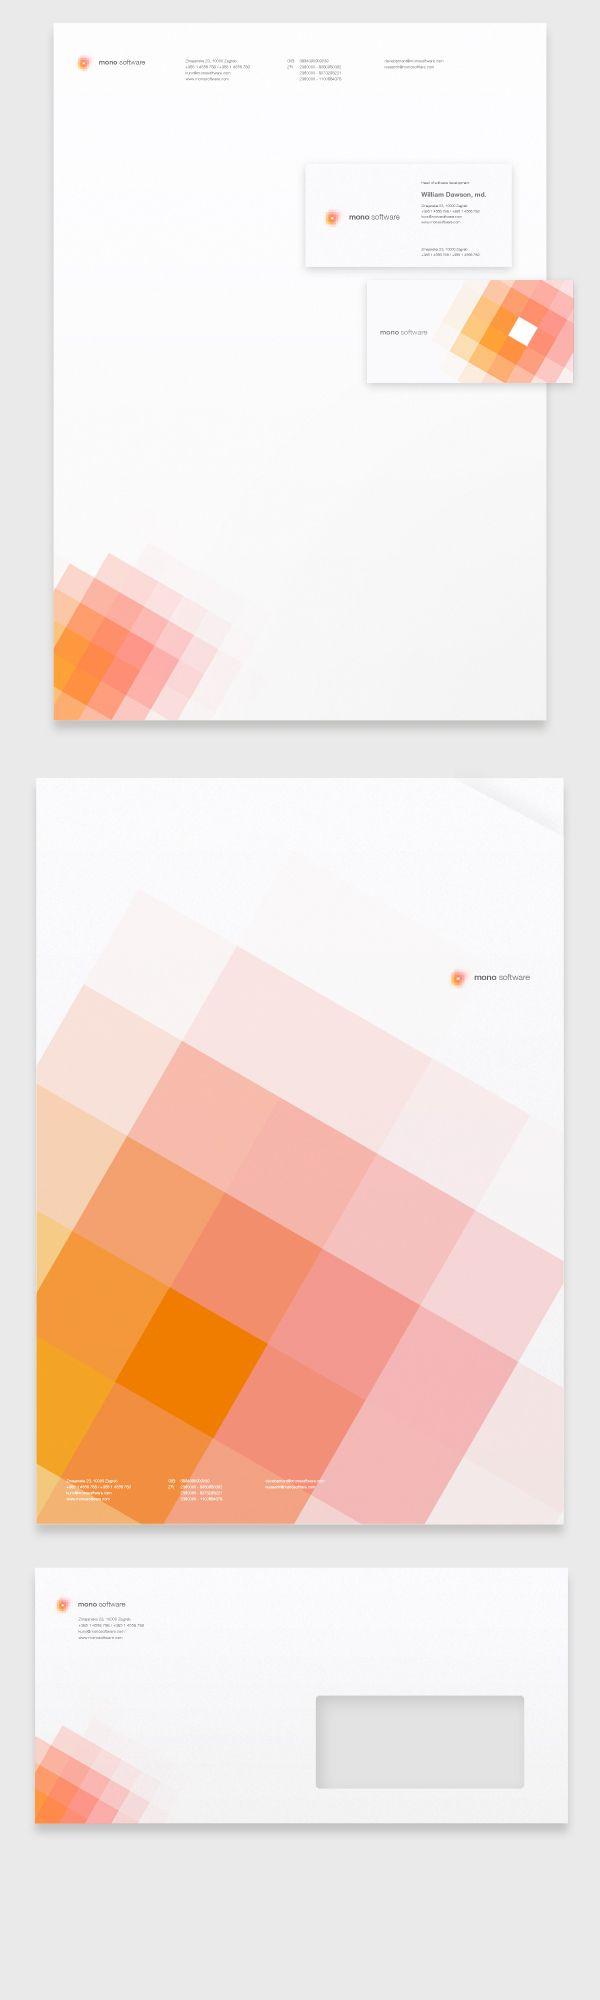 Mono Software Corporate Identity by Krešimir Kraljević, via Behance - Some nice branding here!